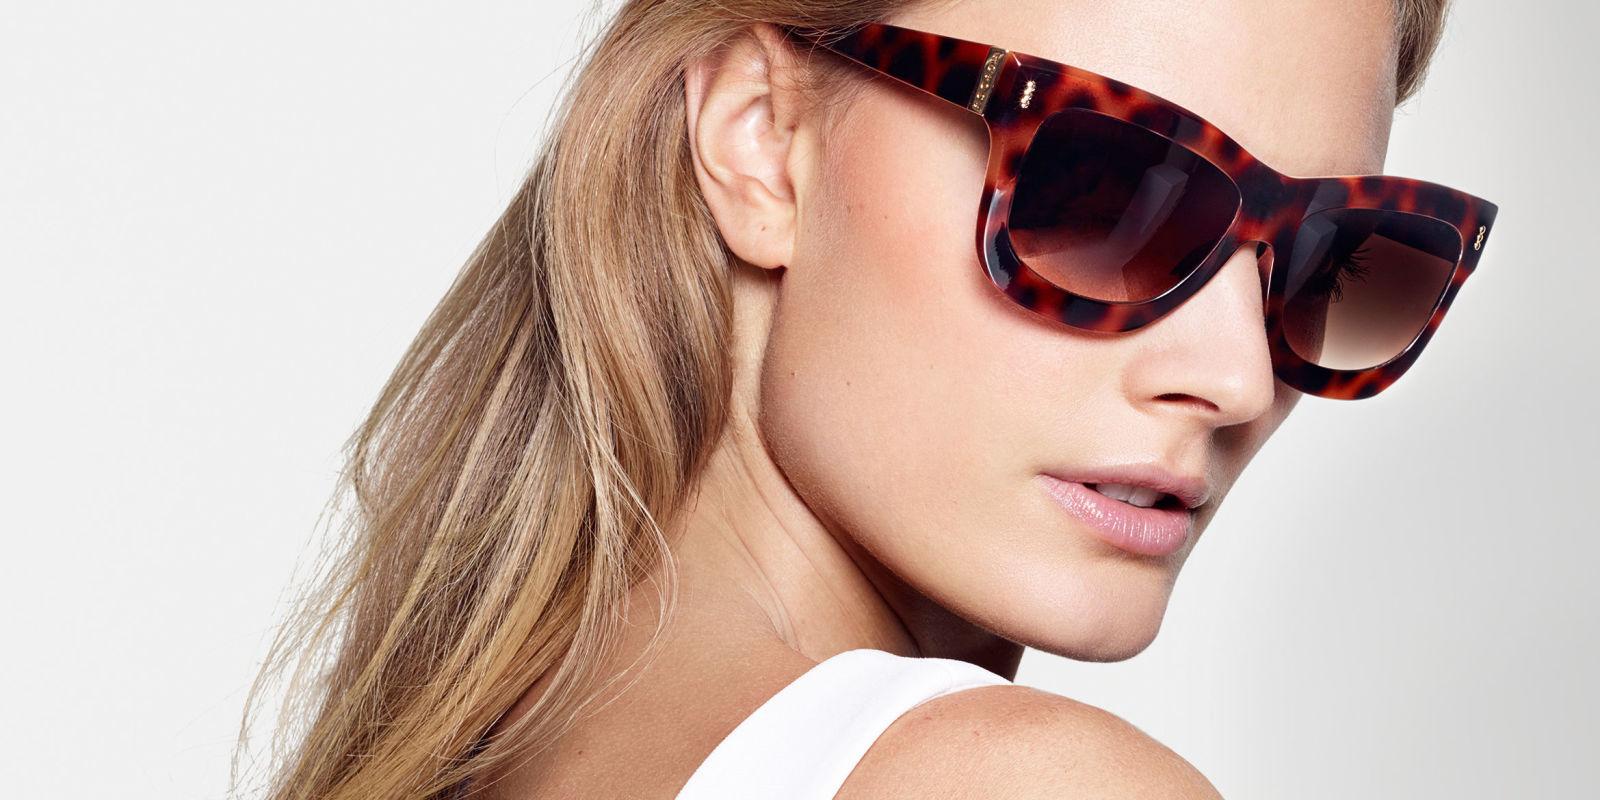 Win a pair of Escada sunglasses